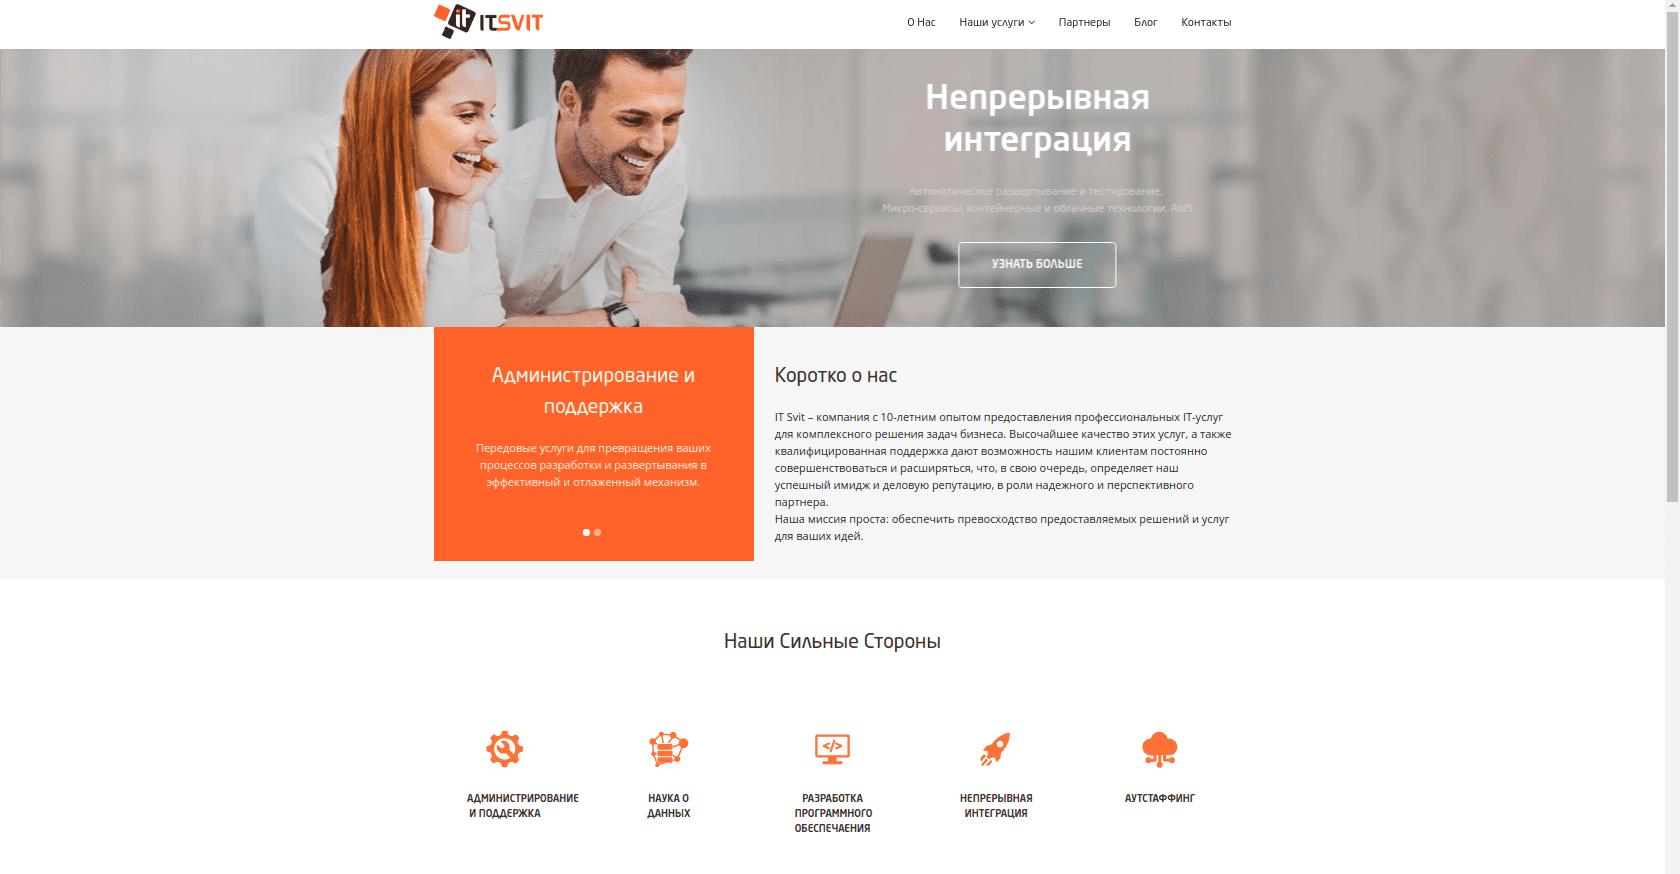 russian-version